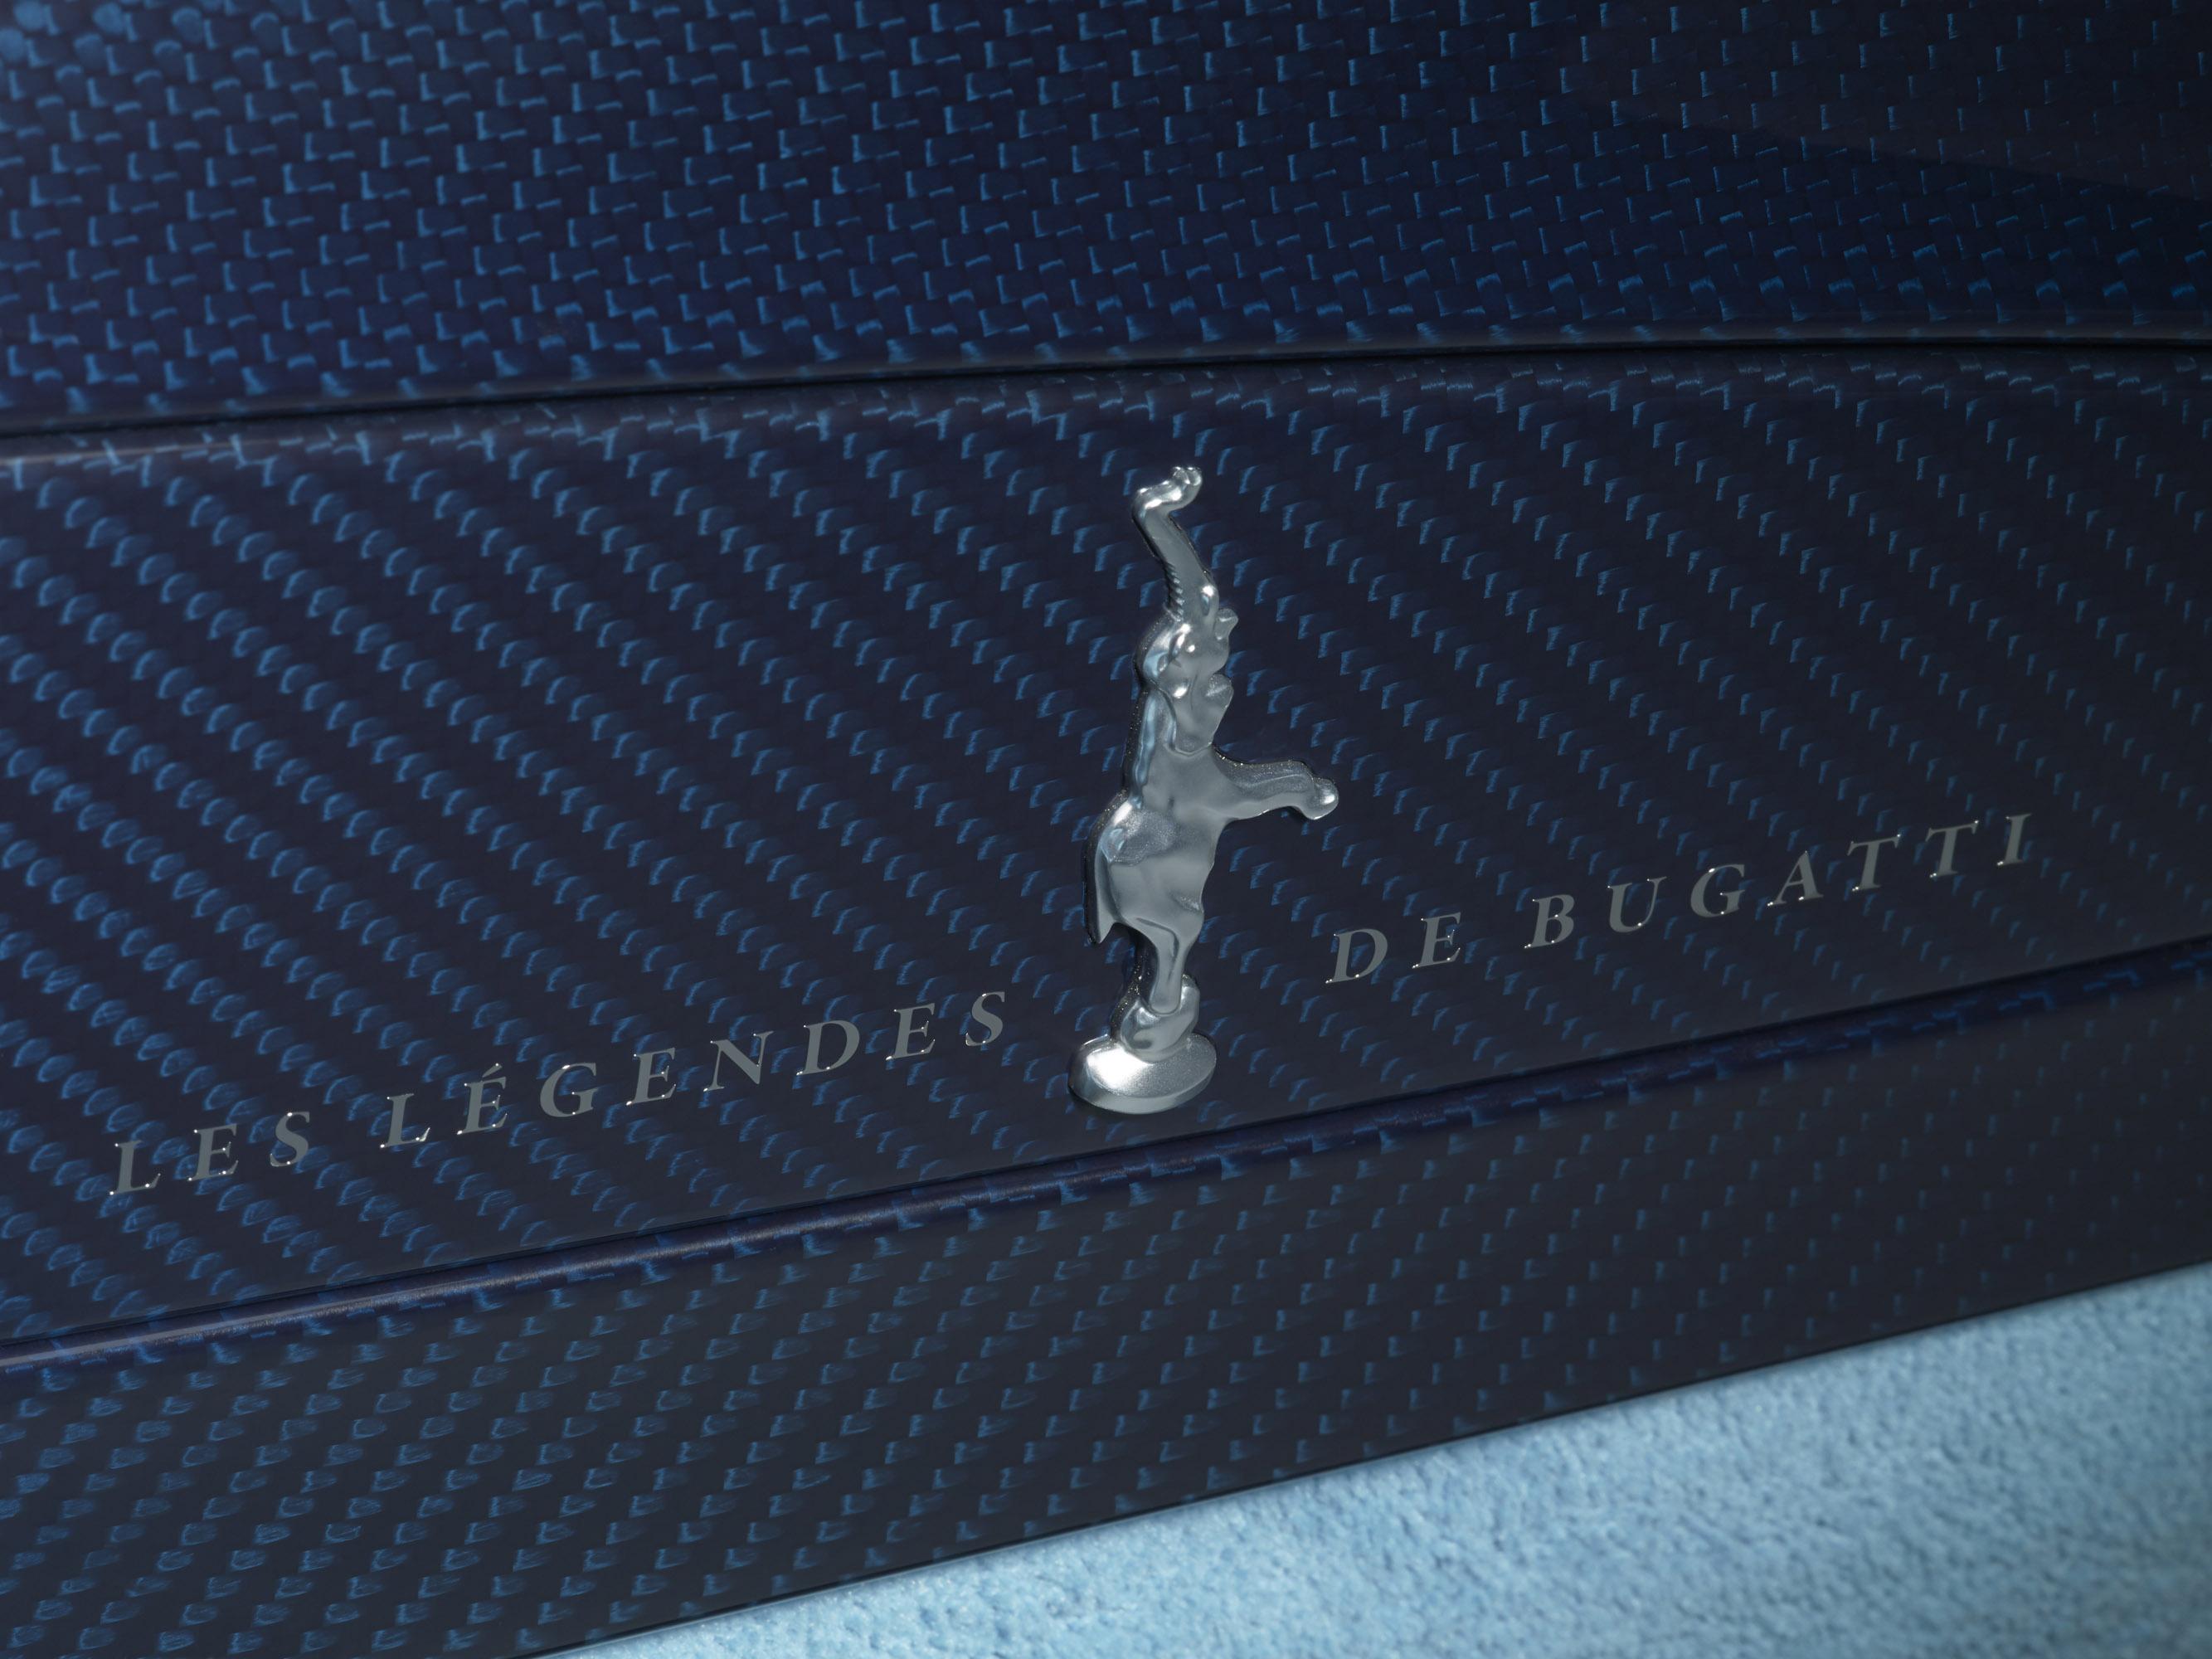 bugatti-veyron-grand-sport-vitesse-jean-pierre-wimille-edition-15 Remarkable Bugatti Veyron Grand Sport Vitesse Black and Blue Cars Trend